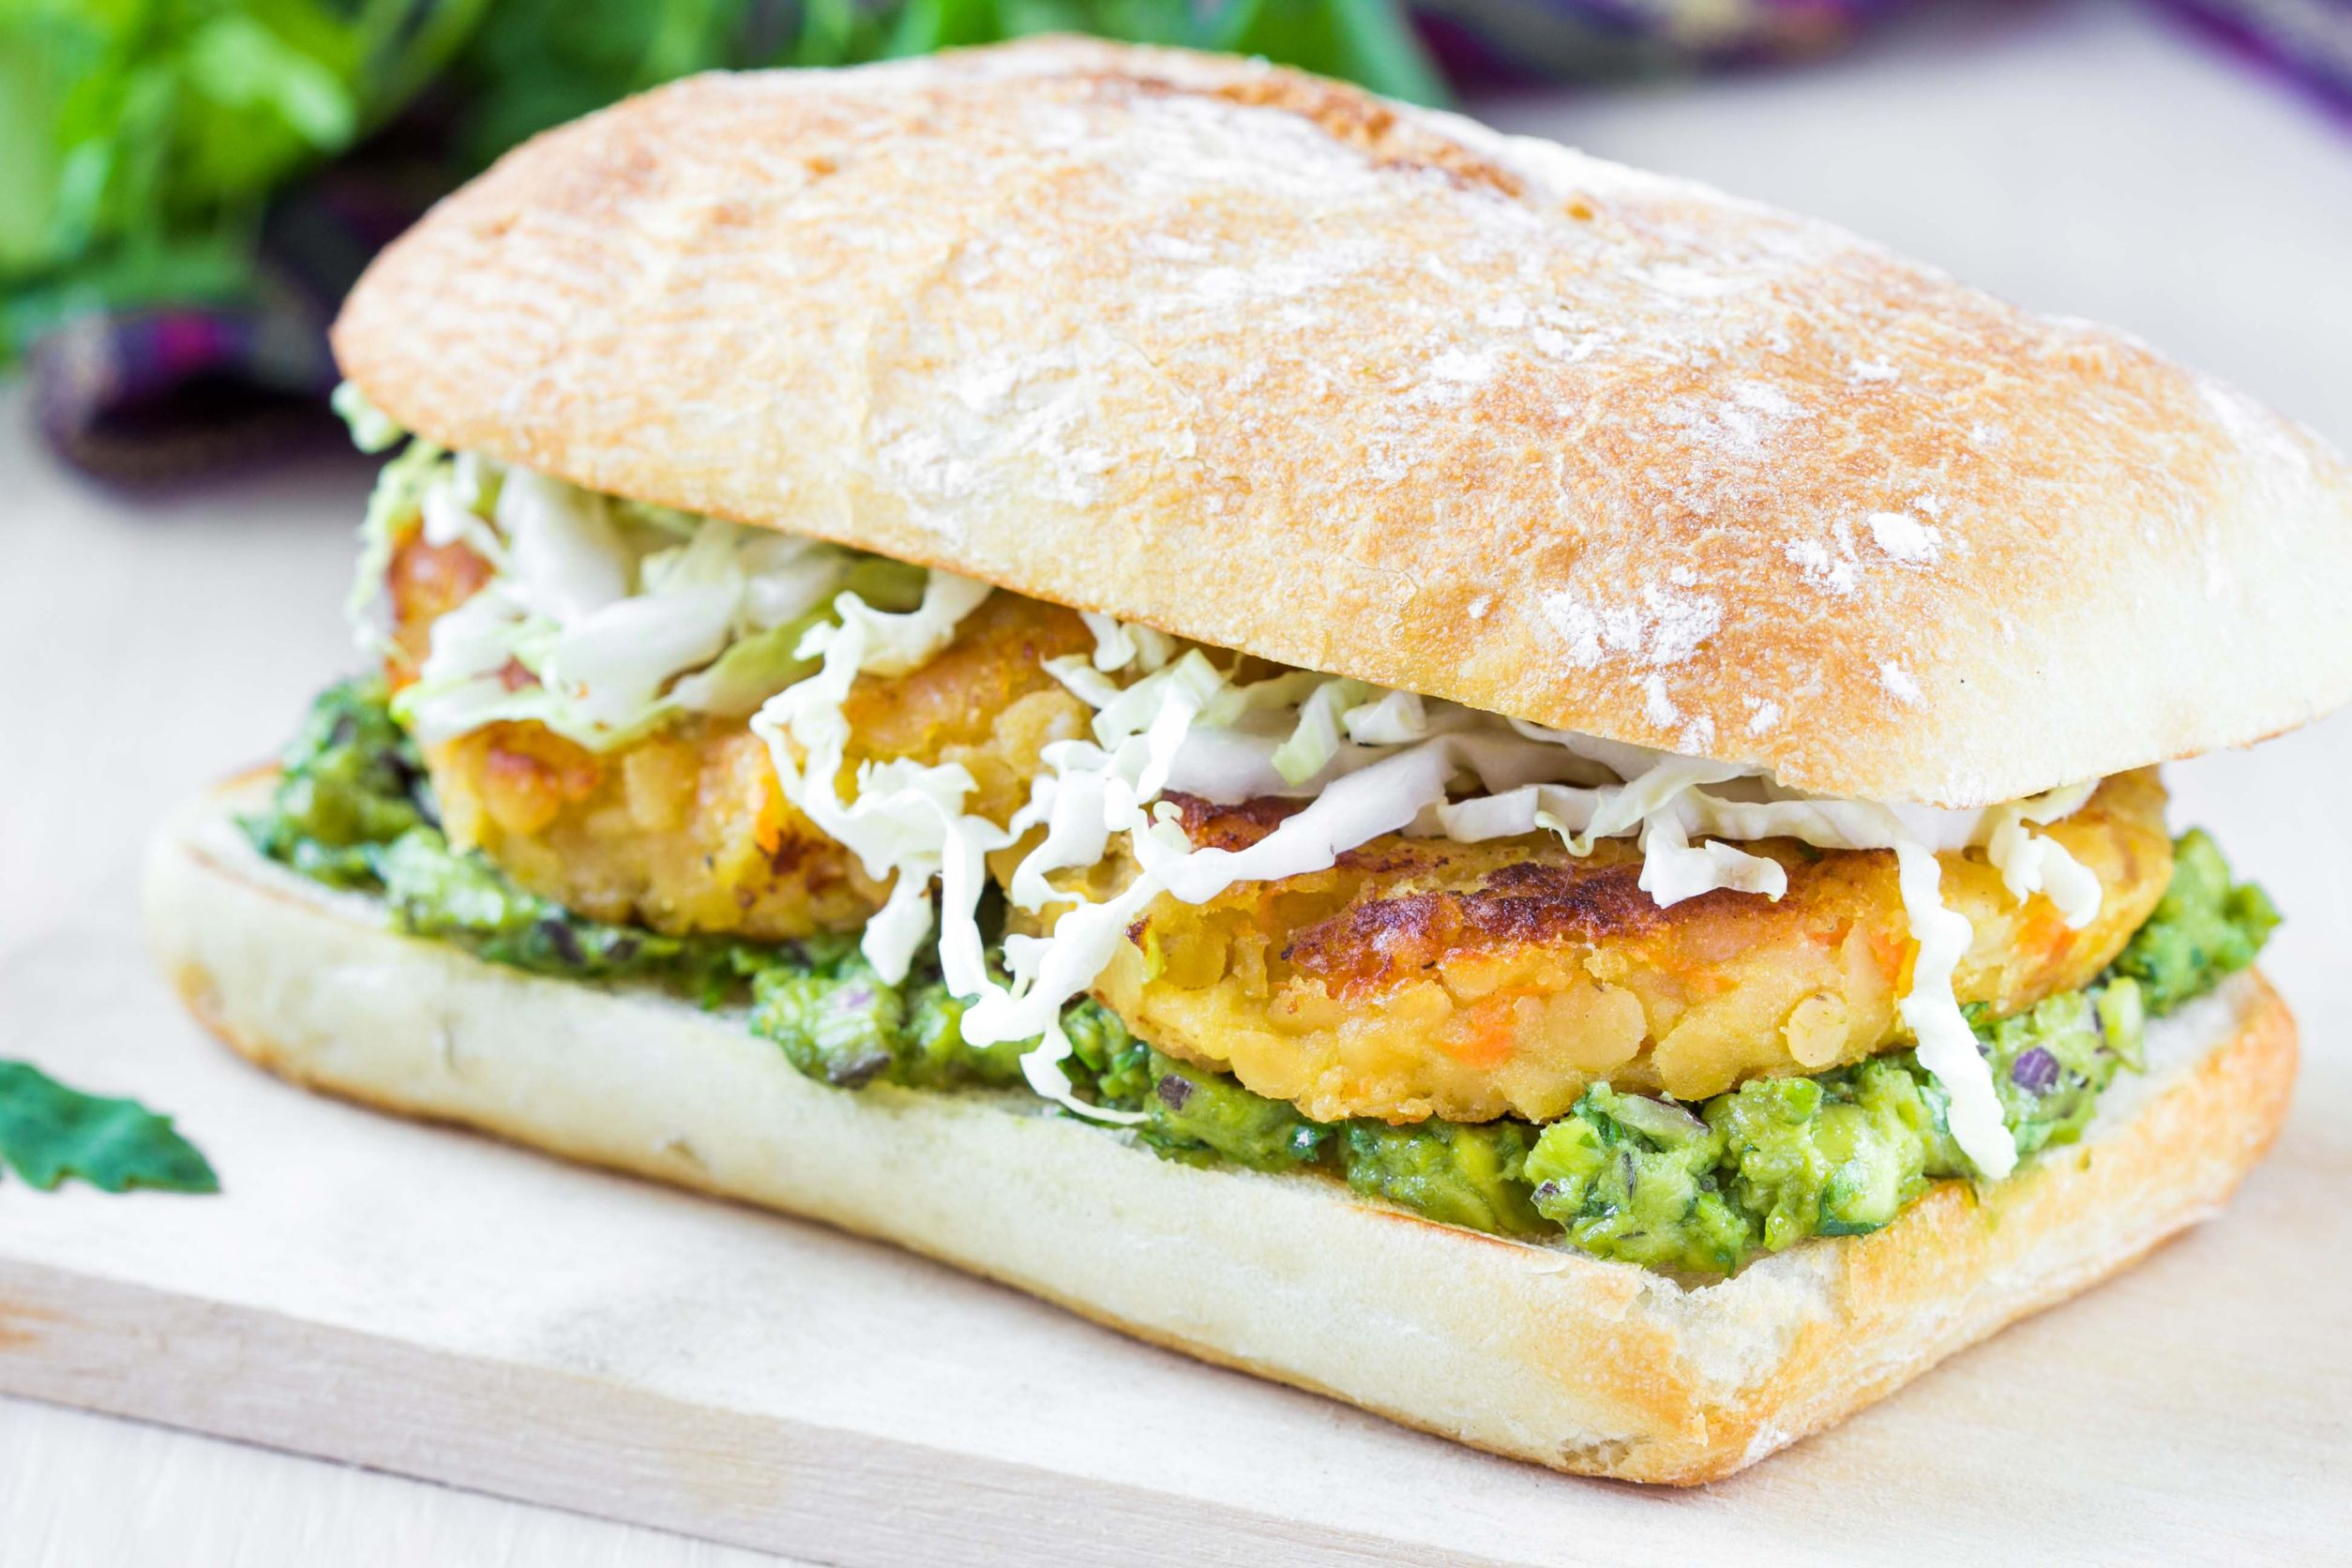 Hearty Vegetarian Recipe: Avocado Tofu Lentil Burgers - 12 Tomatoes